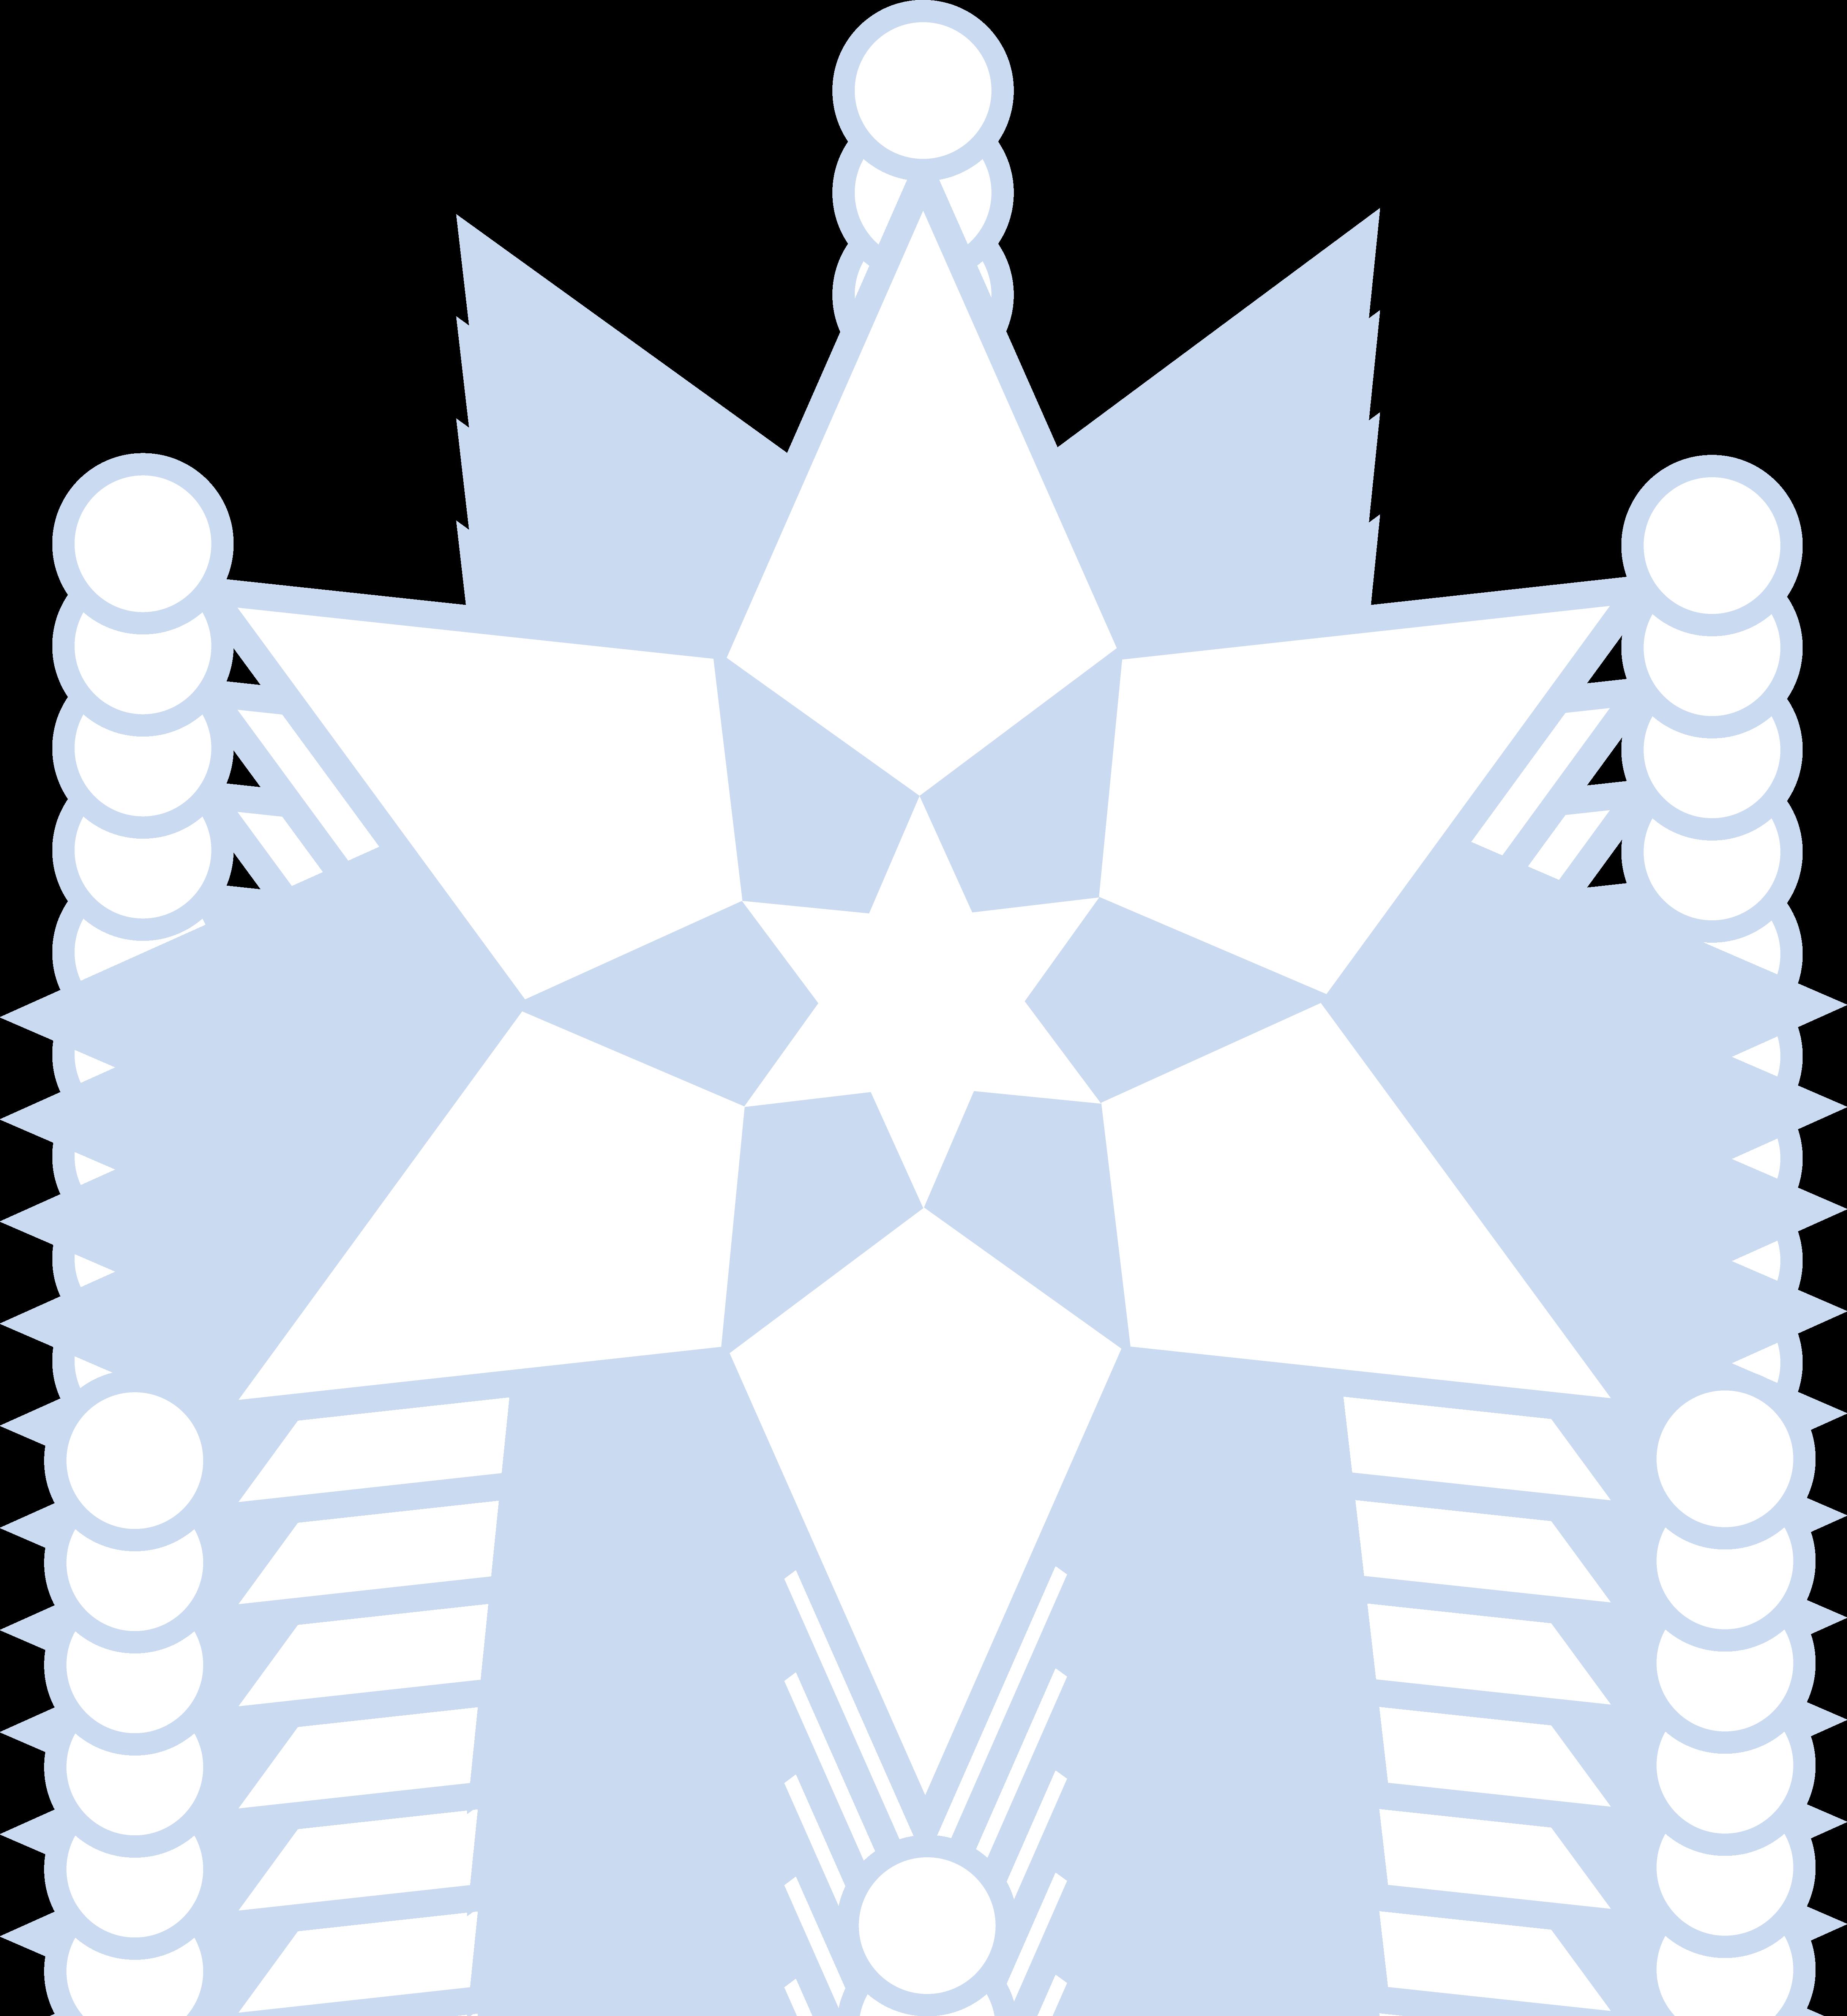 Free clipart snowflake pink jpg freeuse download Winter Snowflake Pattern - Free Clip Art jpg freeuse download